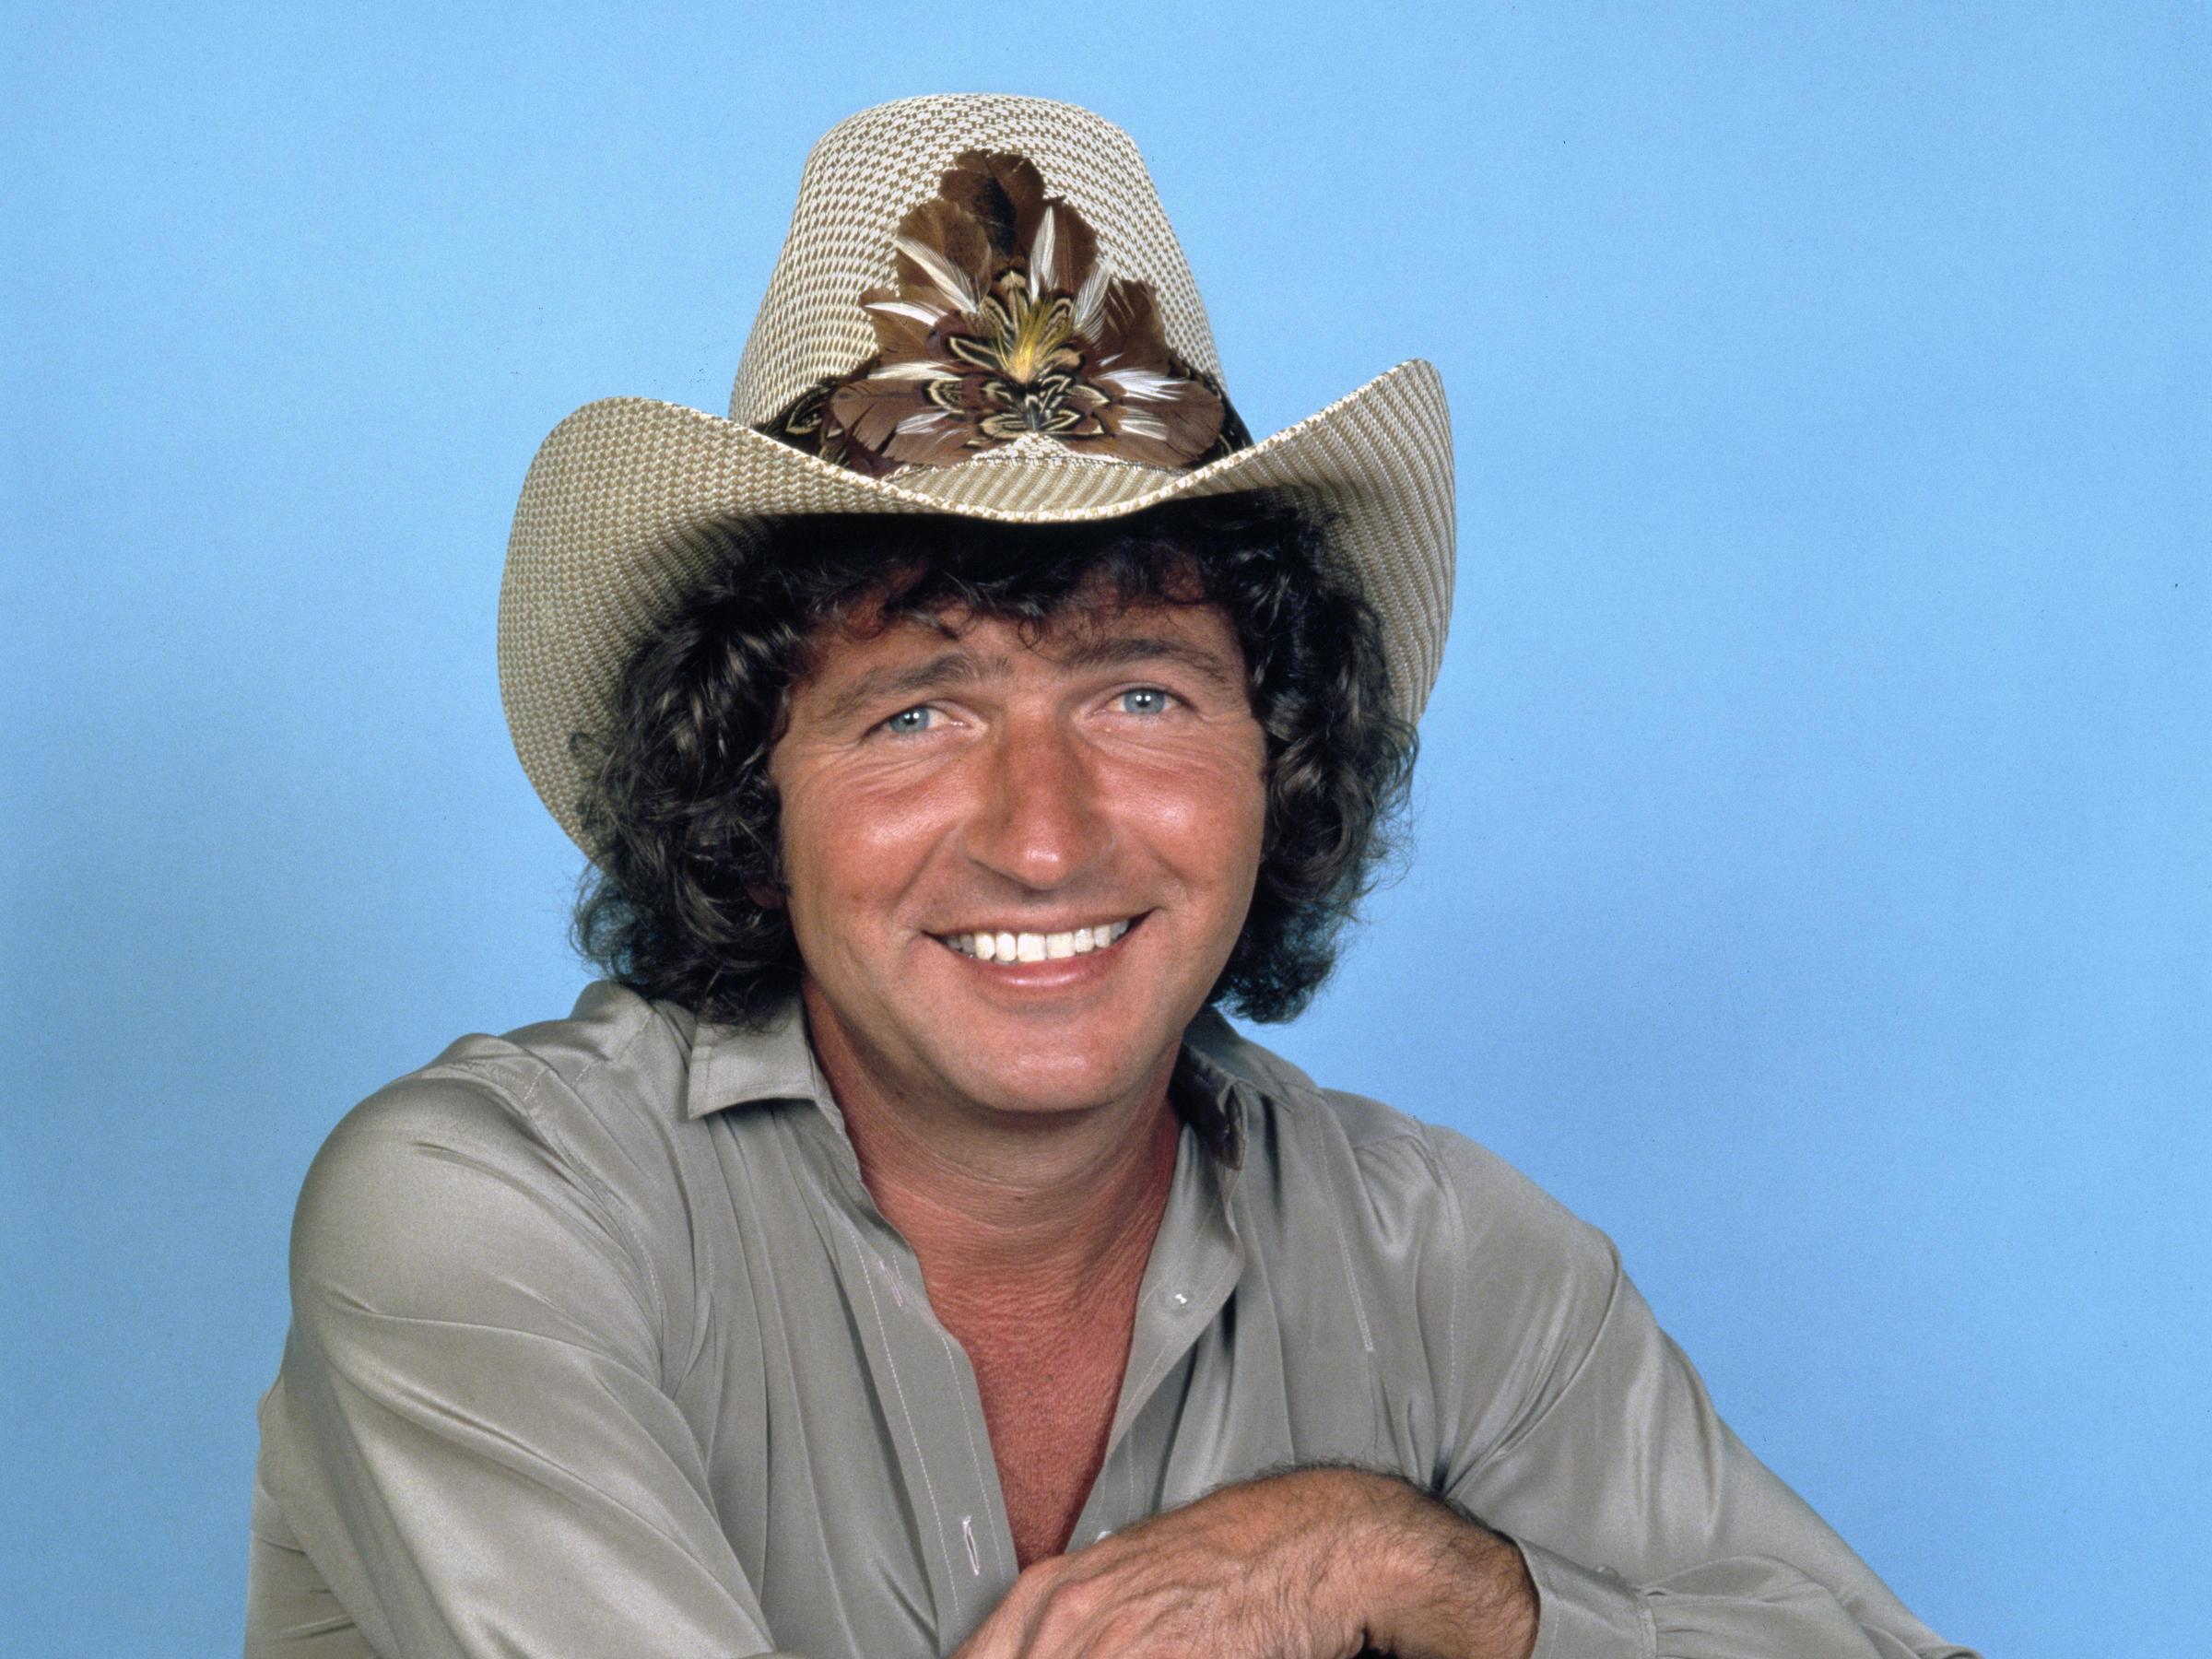 Singer-songwriter Mac Davis dies at 78